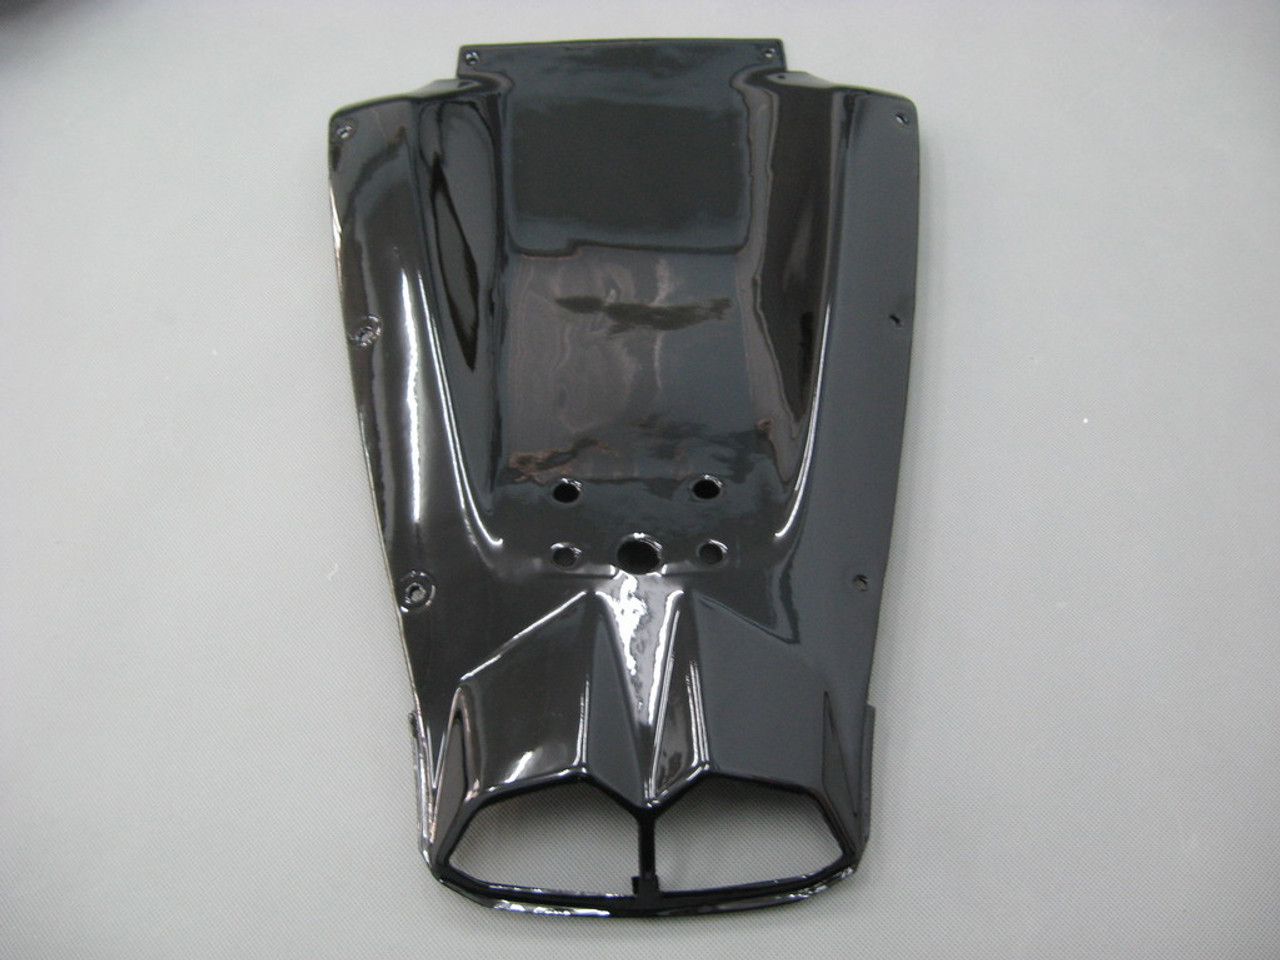 Fairings Yamaha YZF-R6 Contrast Black  R6 Racing (2003-2005)